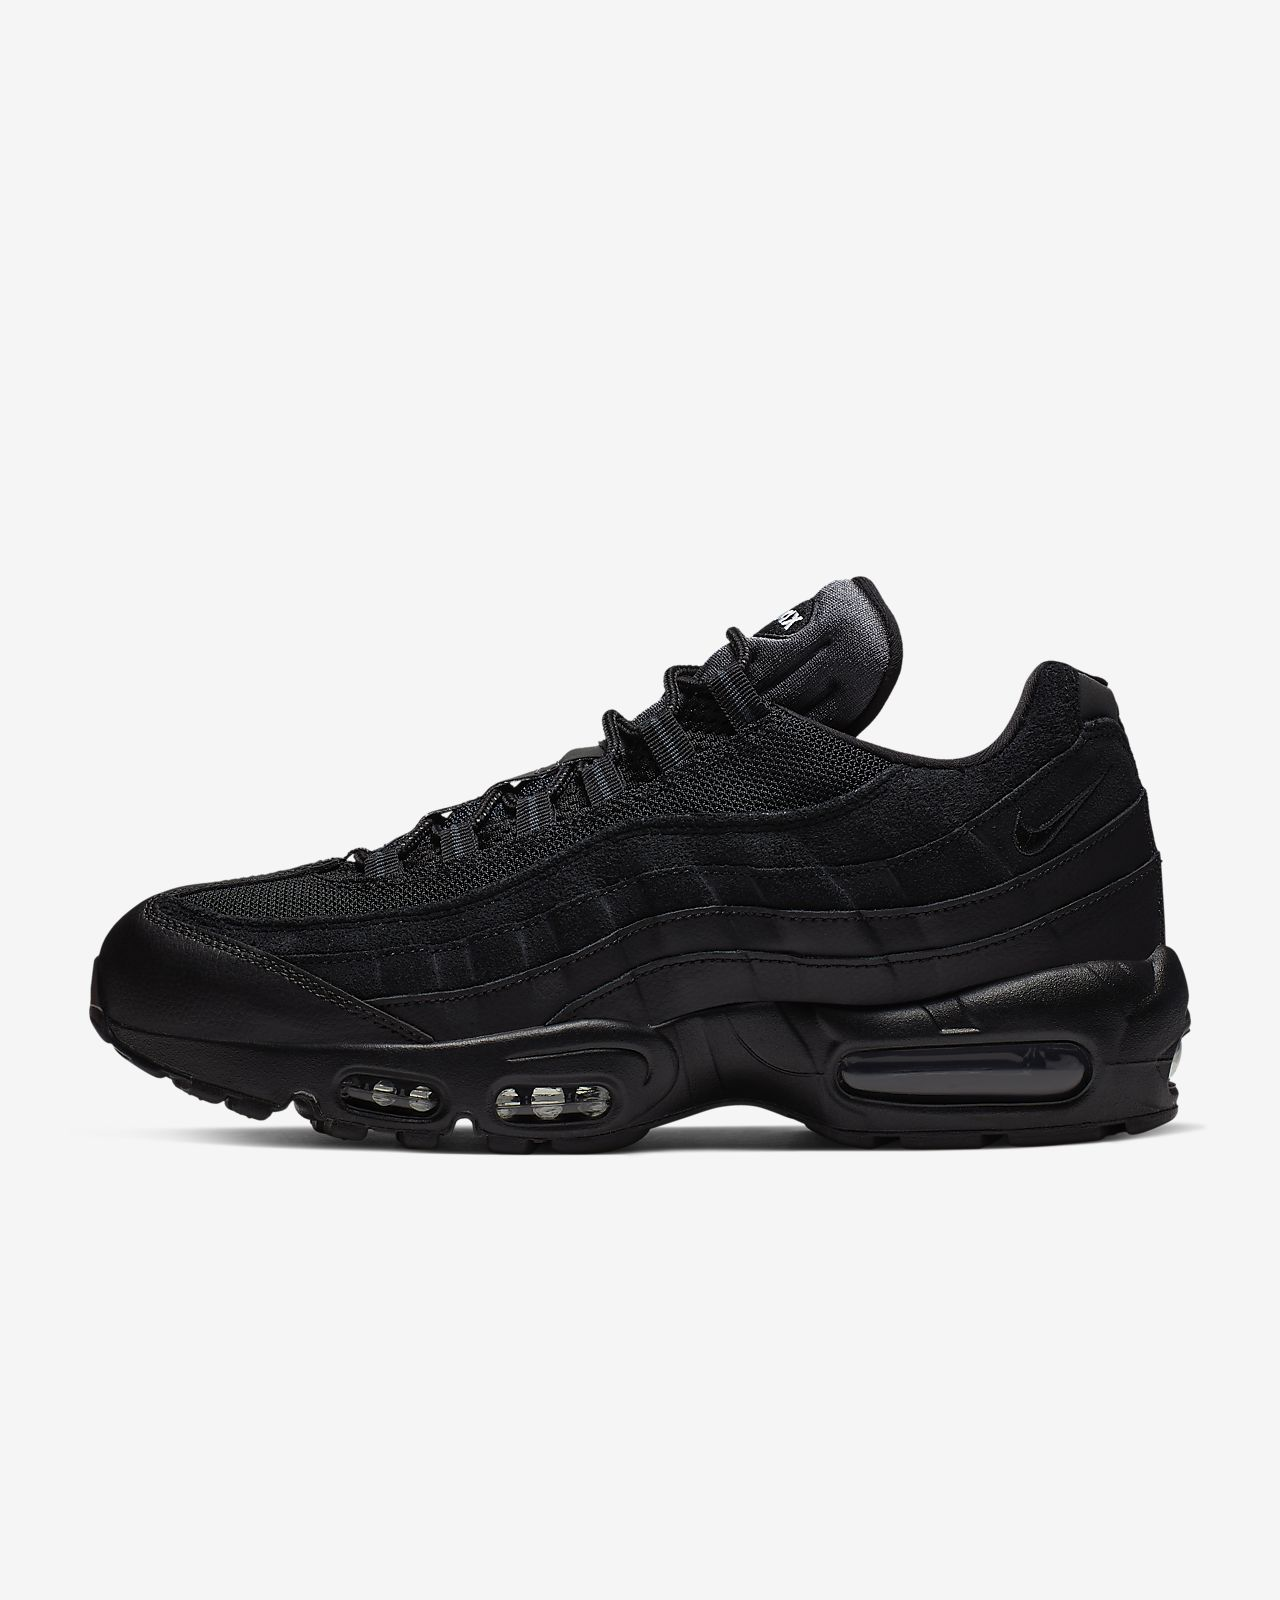 hurtownia online zniżka buty temperamentu Buty uniseks Nike Air Max 95 Essential